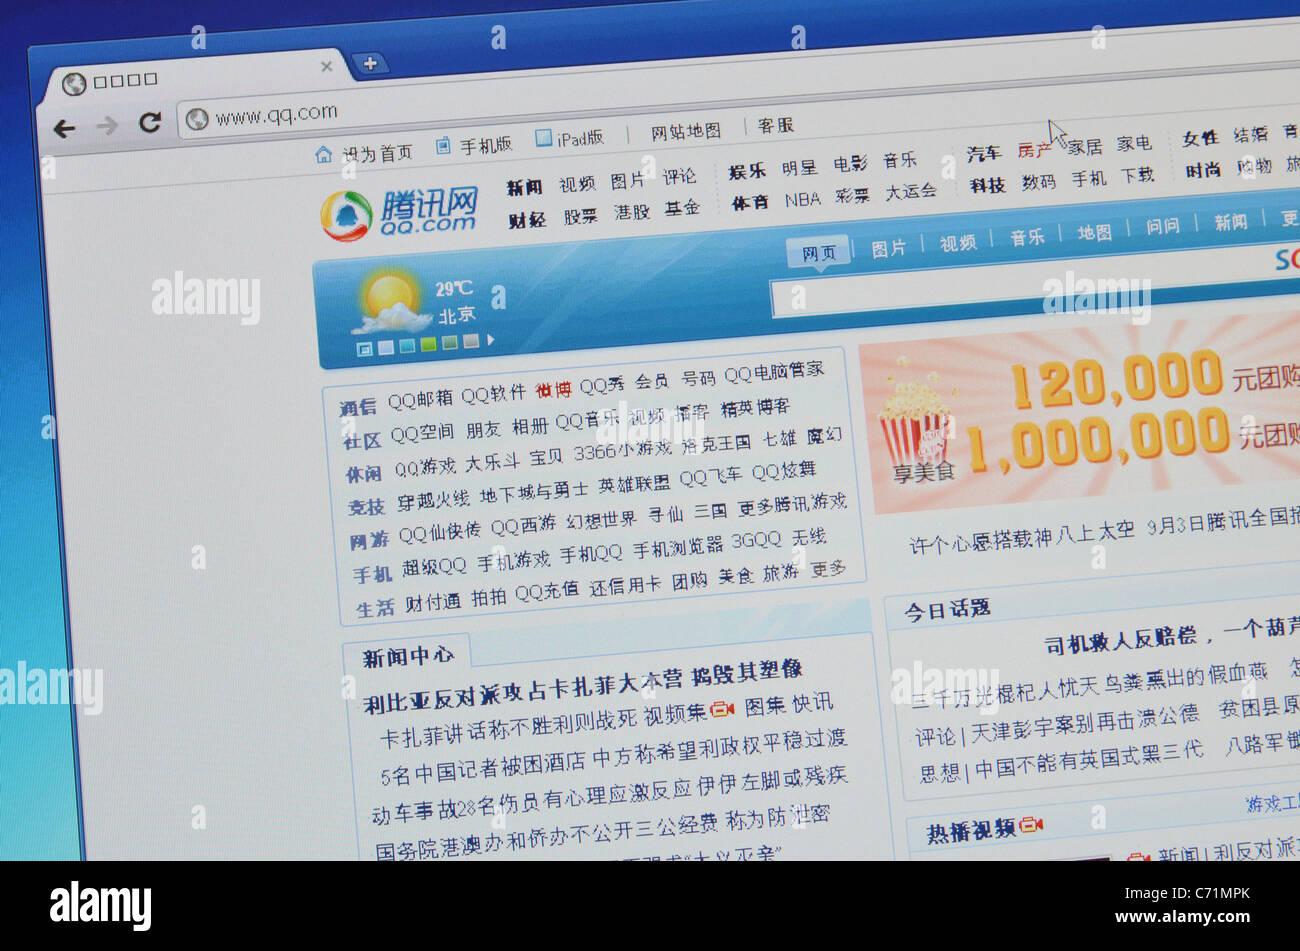 Qq Tencent Website Screenshot Stock Photo Alamy